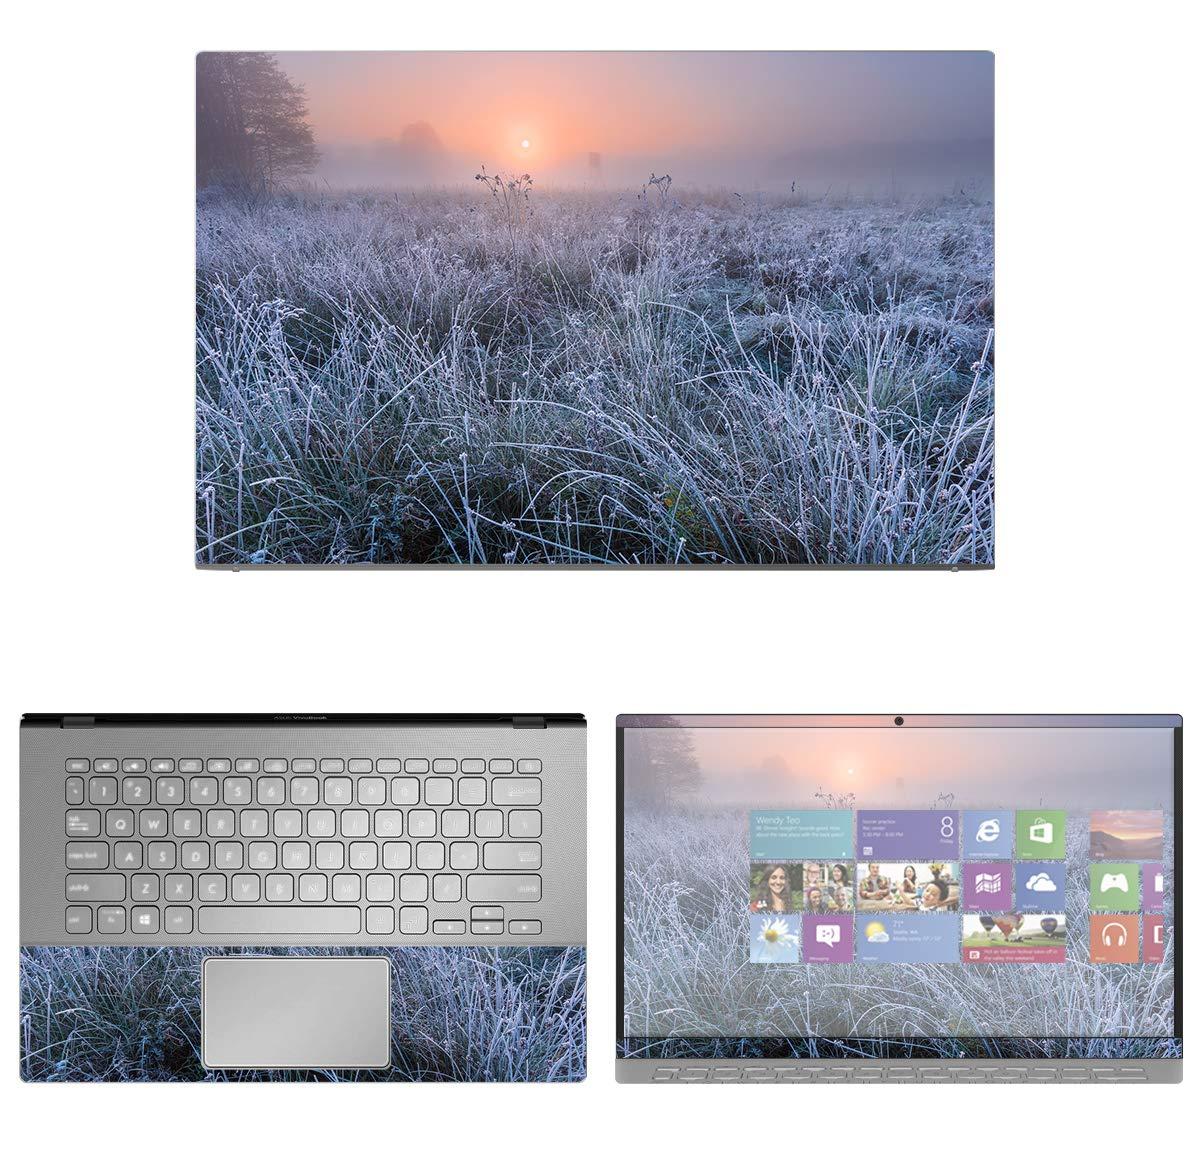 decalrus - Protective Decal Foggy Sunrise Skin Sticker for Asus VivoBook 14 X420UA (14'' Screen) case Cover wrap ASvivobk14_x420ua-162